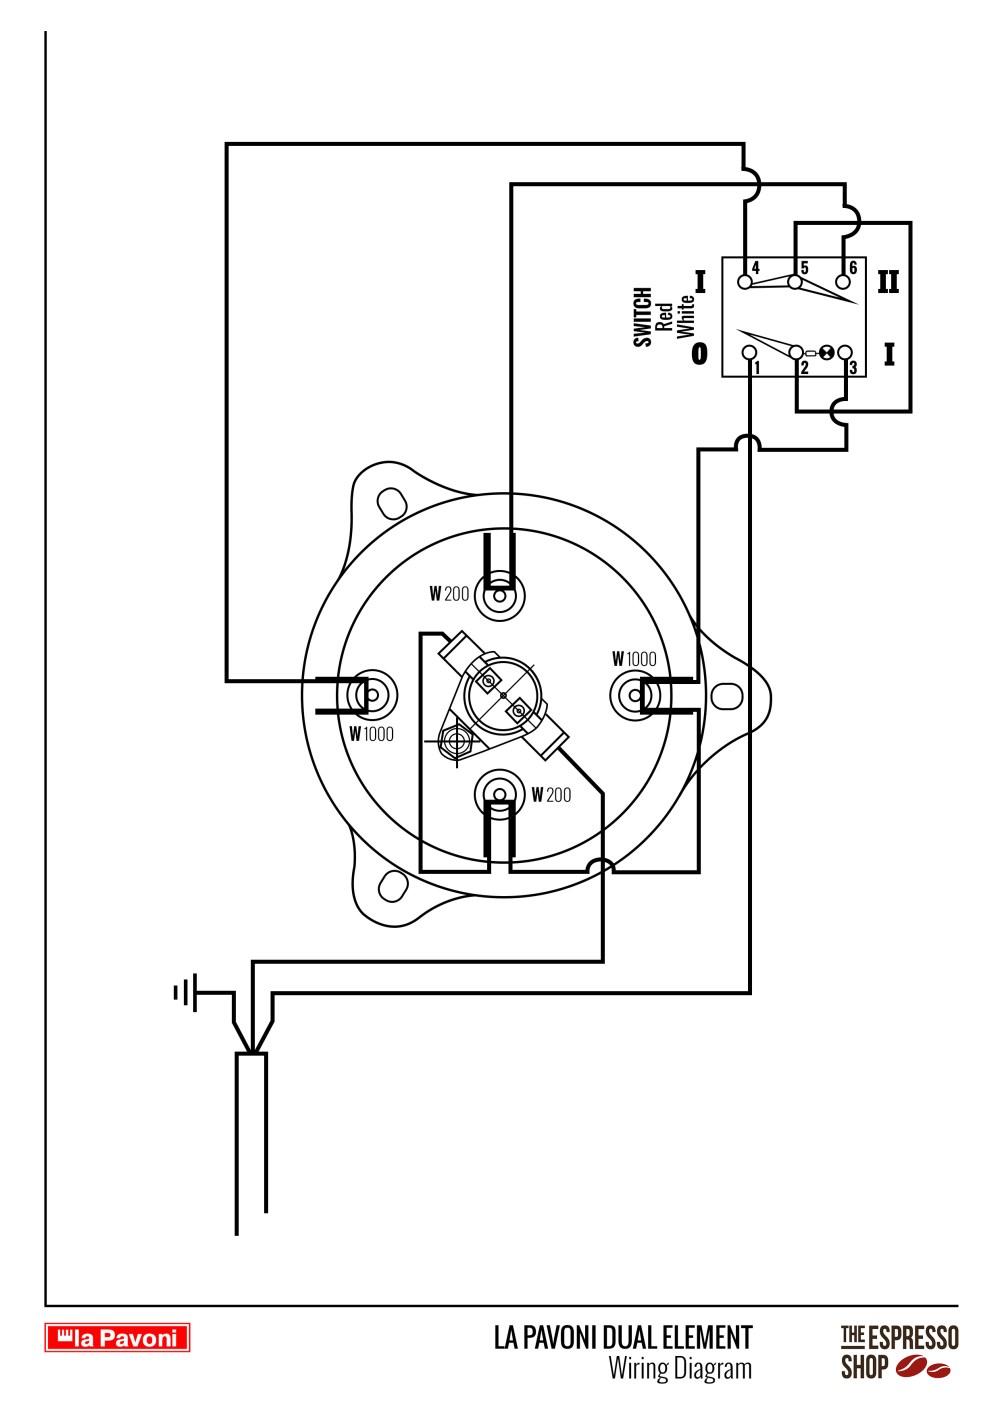 medium resolution of shop wiring diagram wiring diagram megashop wiring diagrams wiring diagram shop vac wiring diagram shop wiring